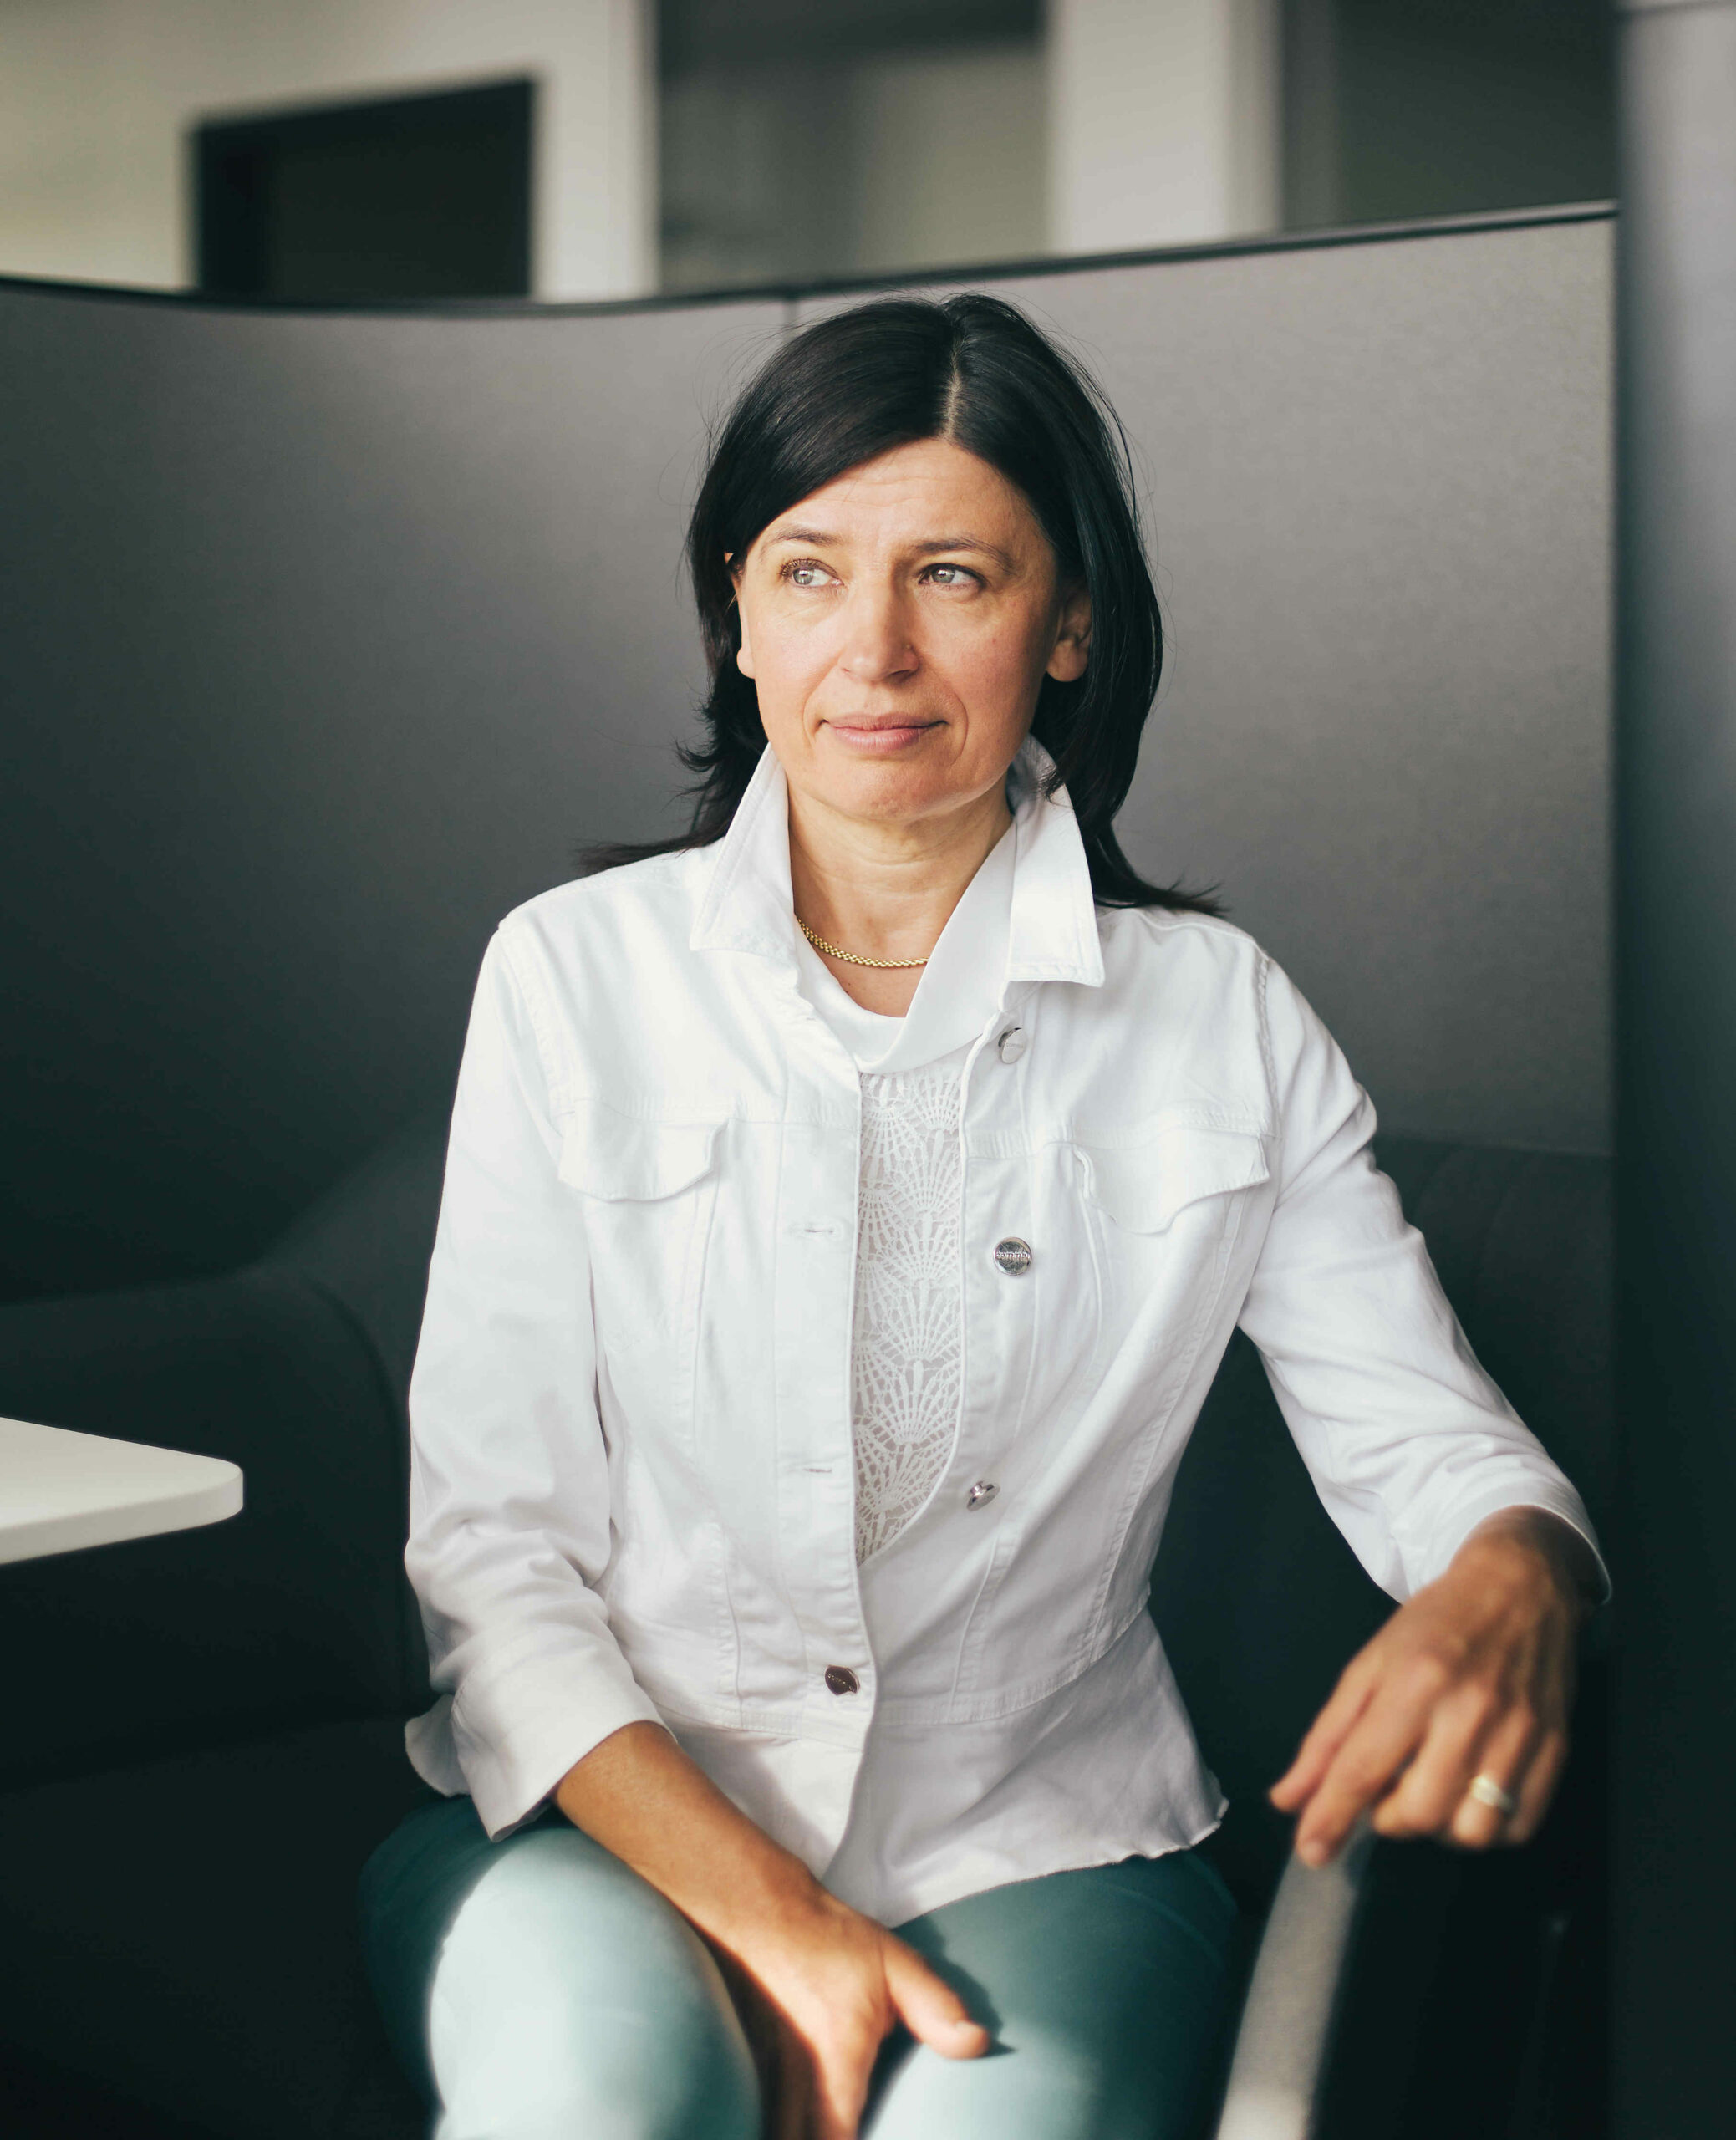 Foto von Dr. Mariola Fotin-Mleczek